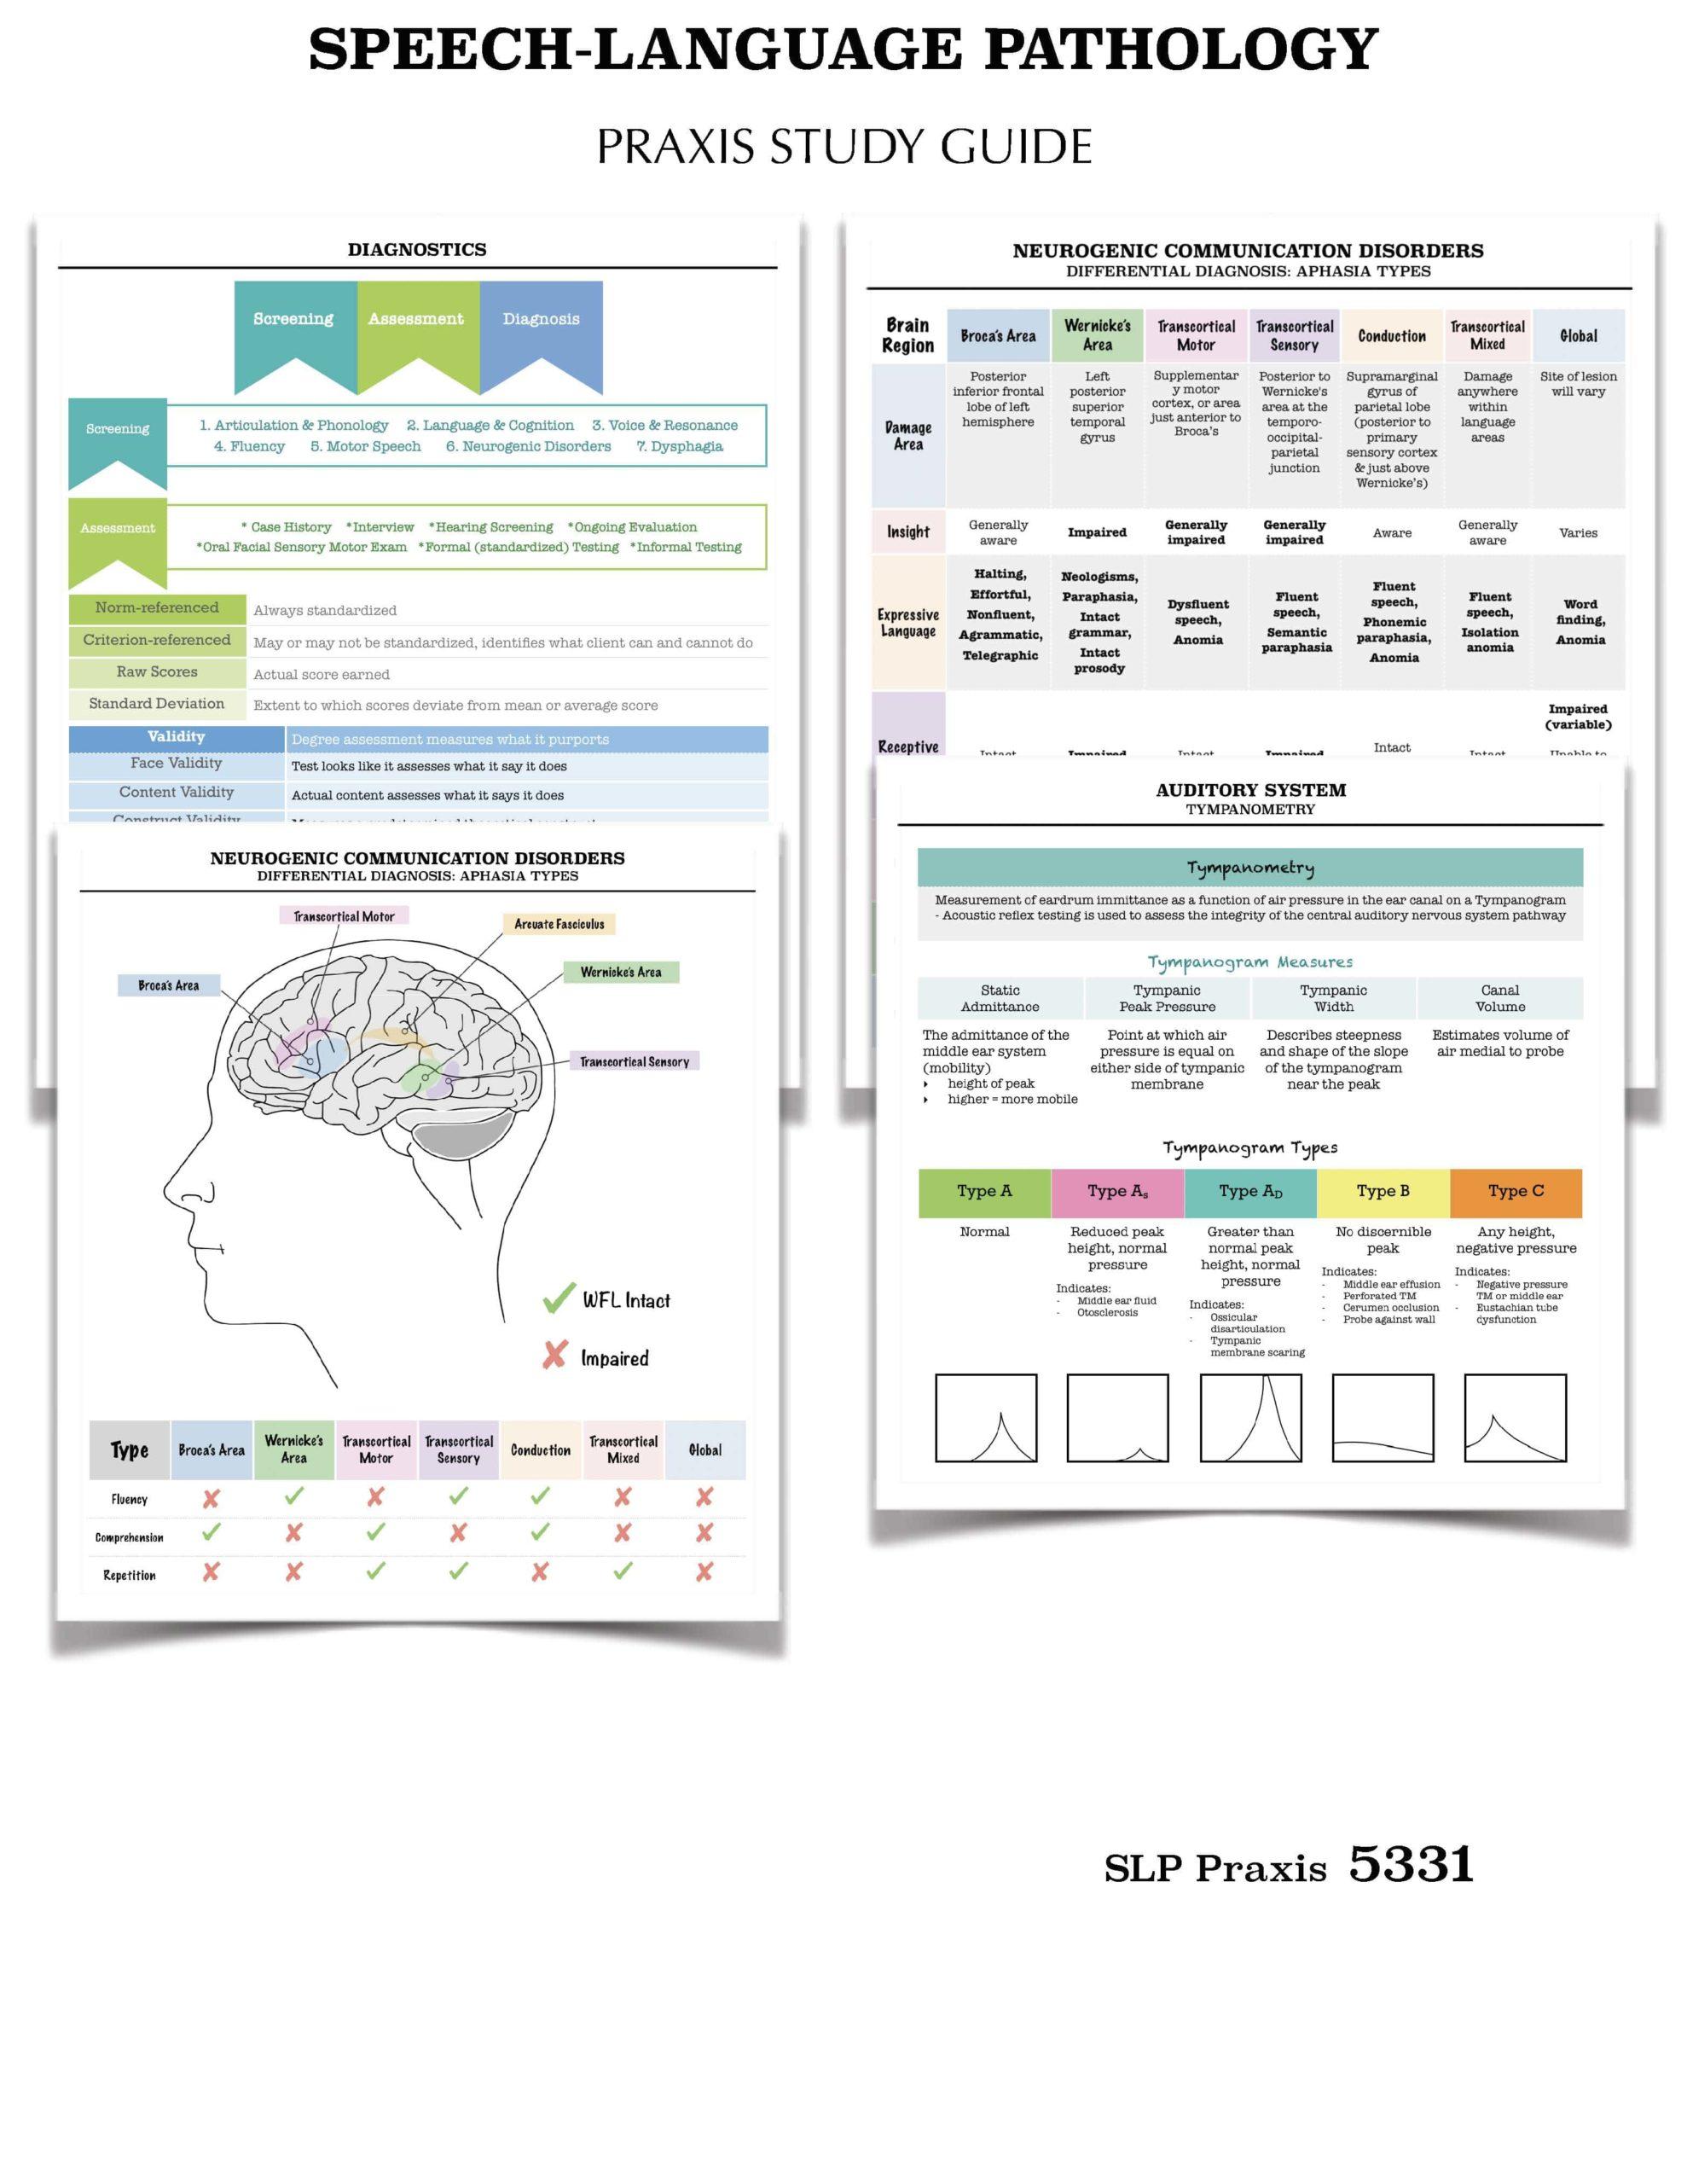 Speech Language Pathology Slp Praxis Study Guide